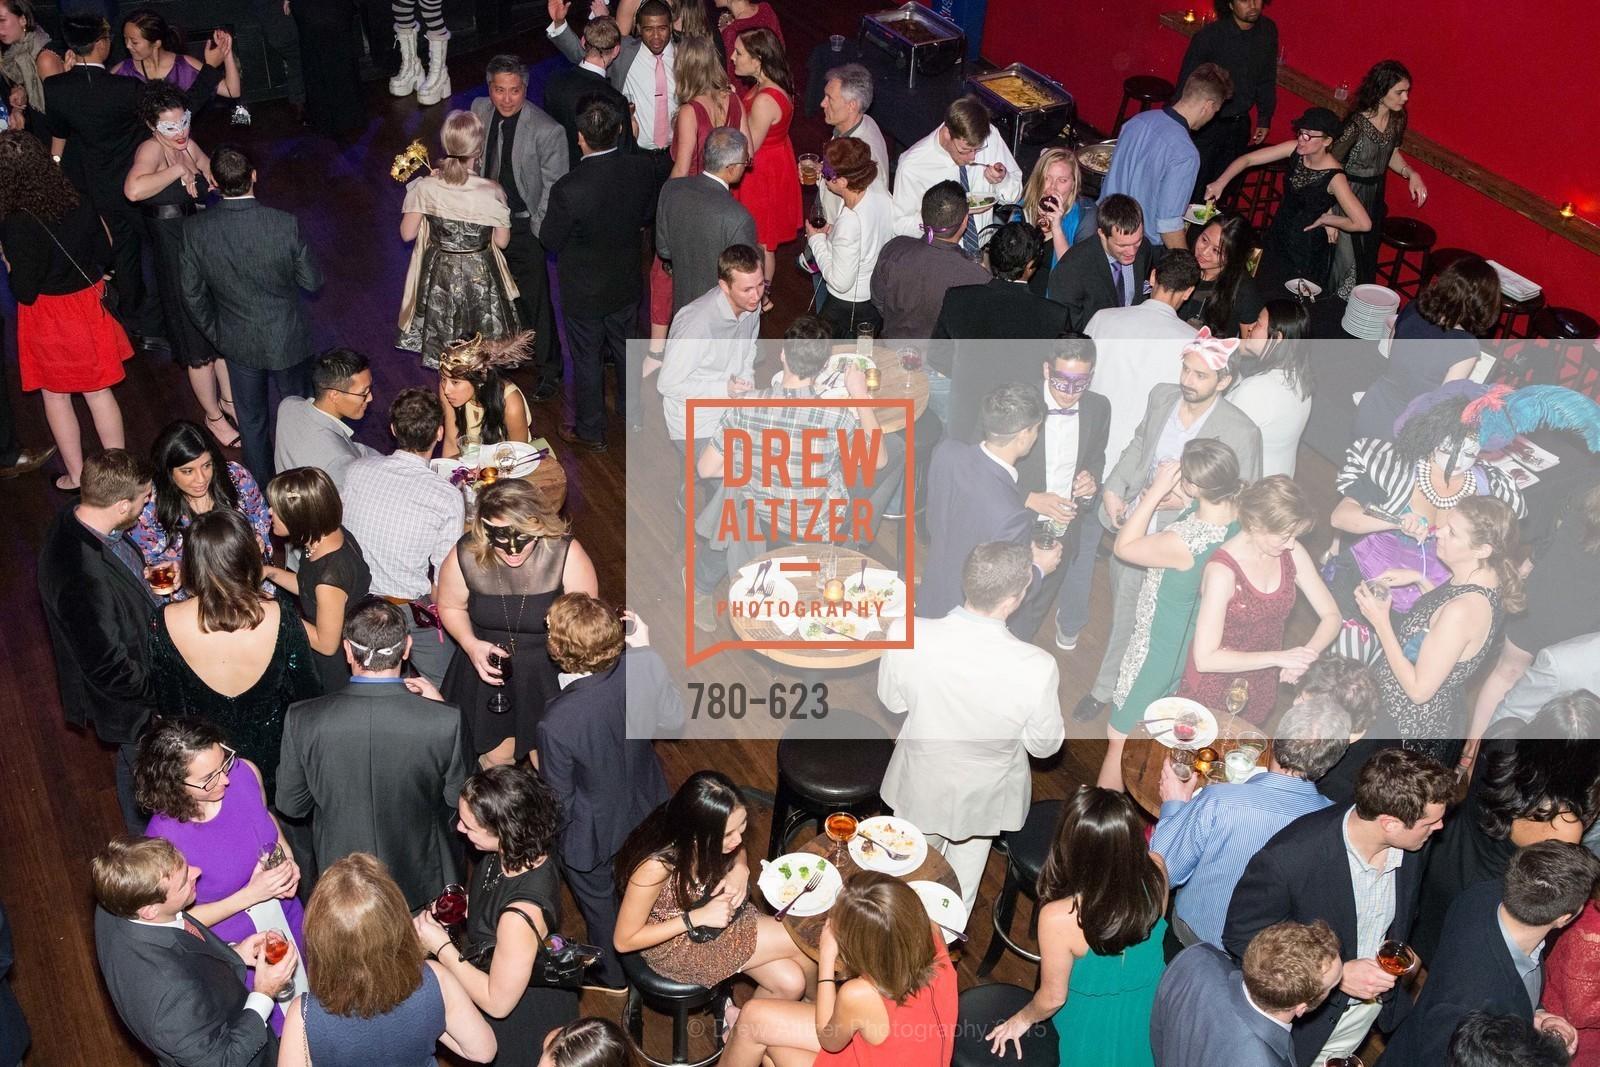 Atmosphere, NerdWallet's Cirque Du Nerd, December 4th, 2015, Photo,Drew Altizer, Drew Altizer Photography, full-service agency, private events, San Francisco photographer, photographer california